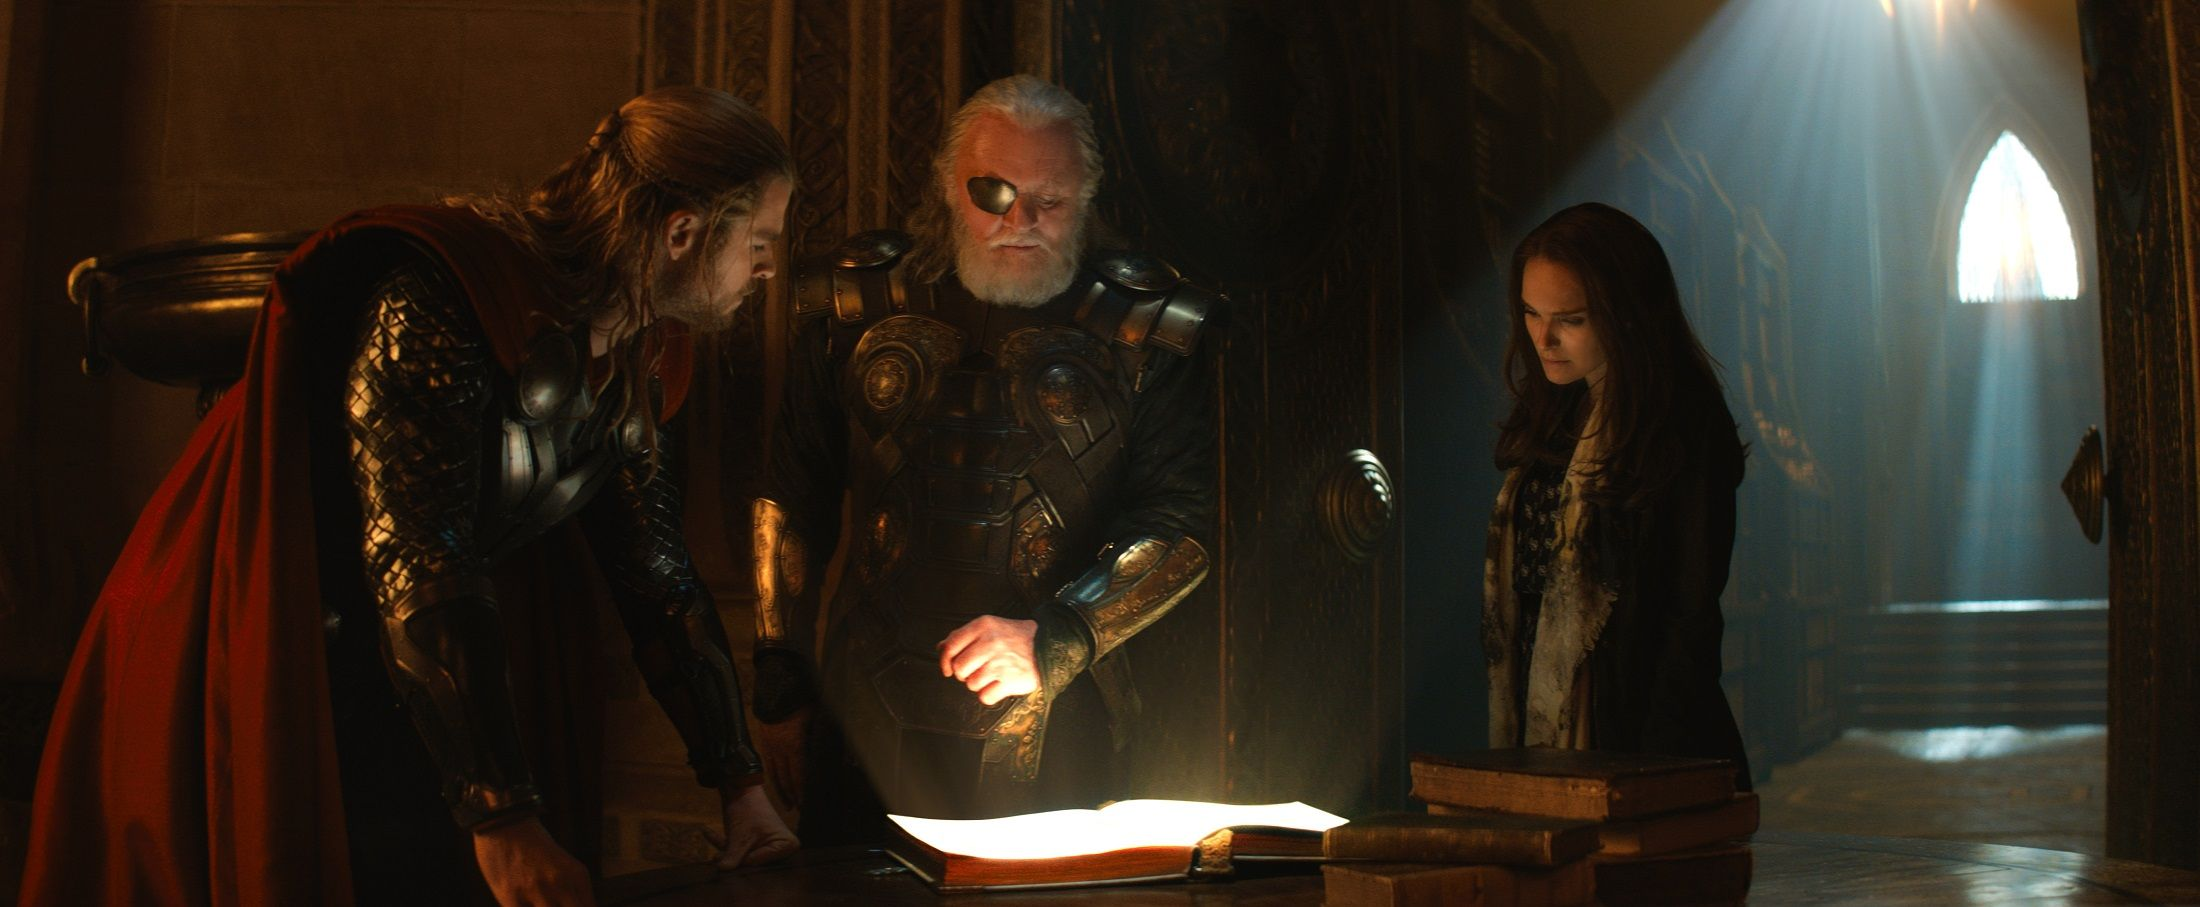 Thor 2 Pics The Dark World 13